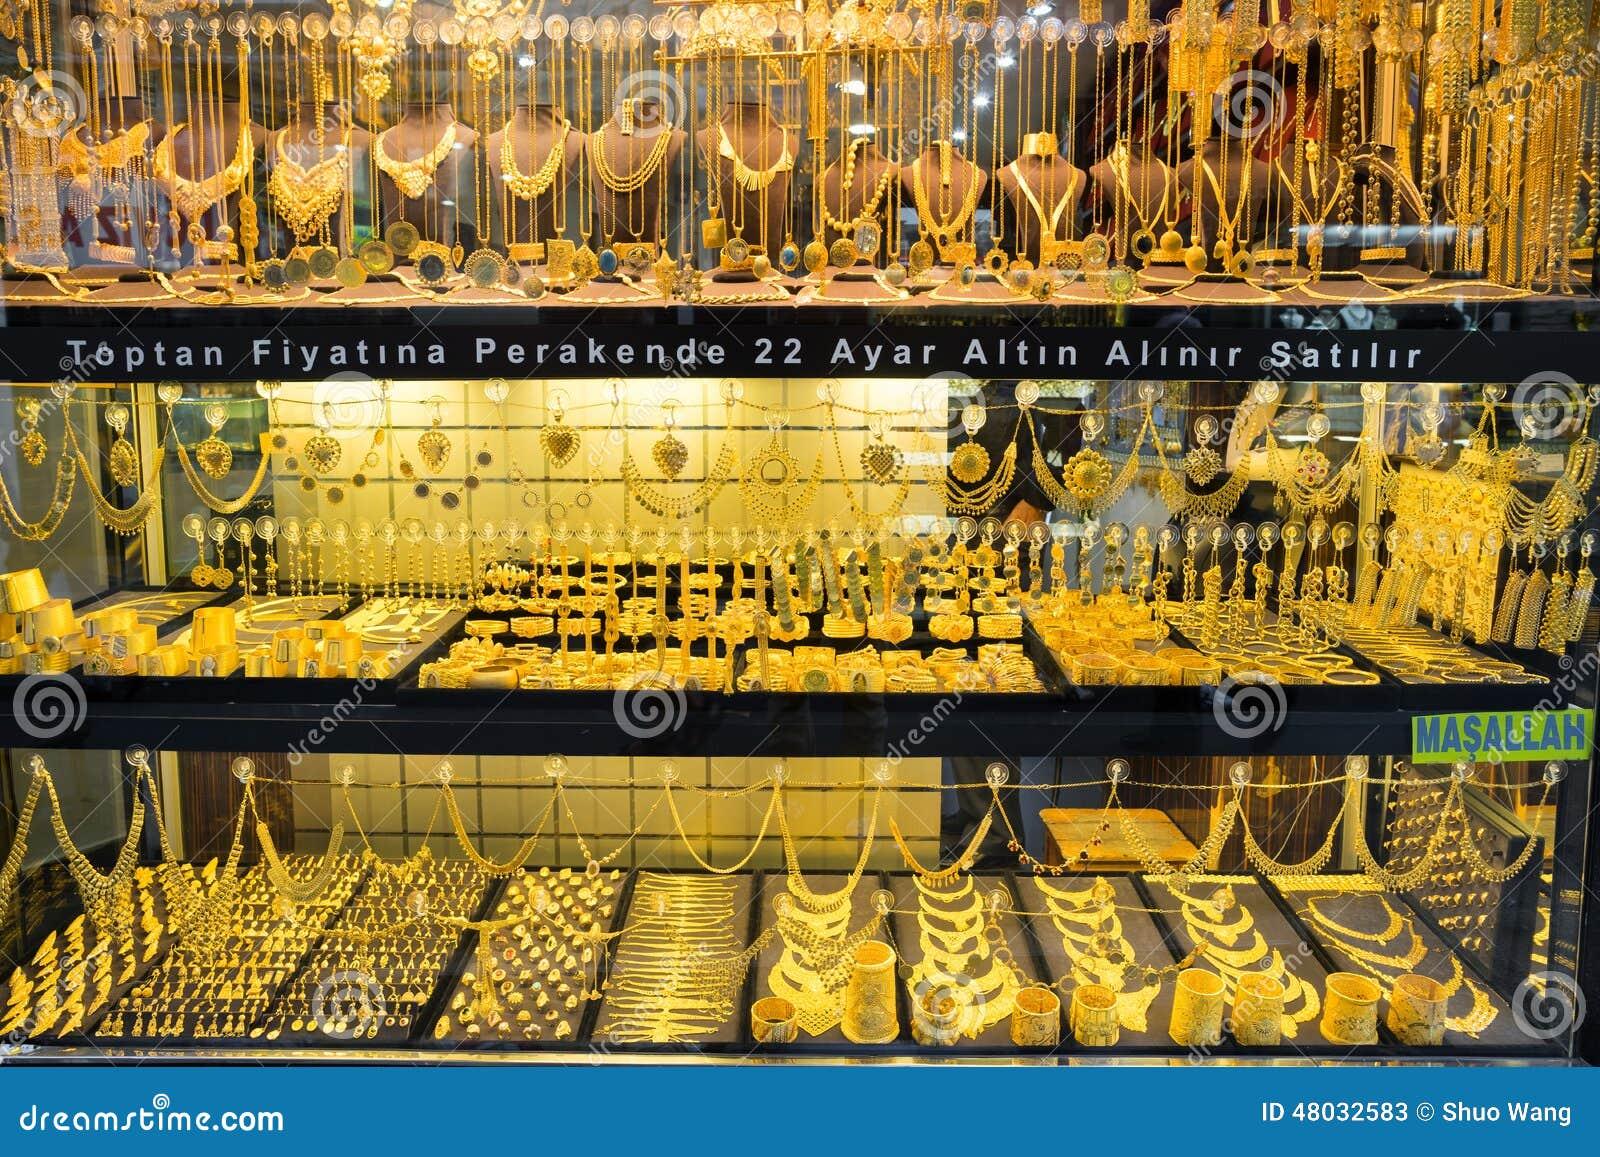 Jewelry Shop Business Plan